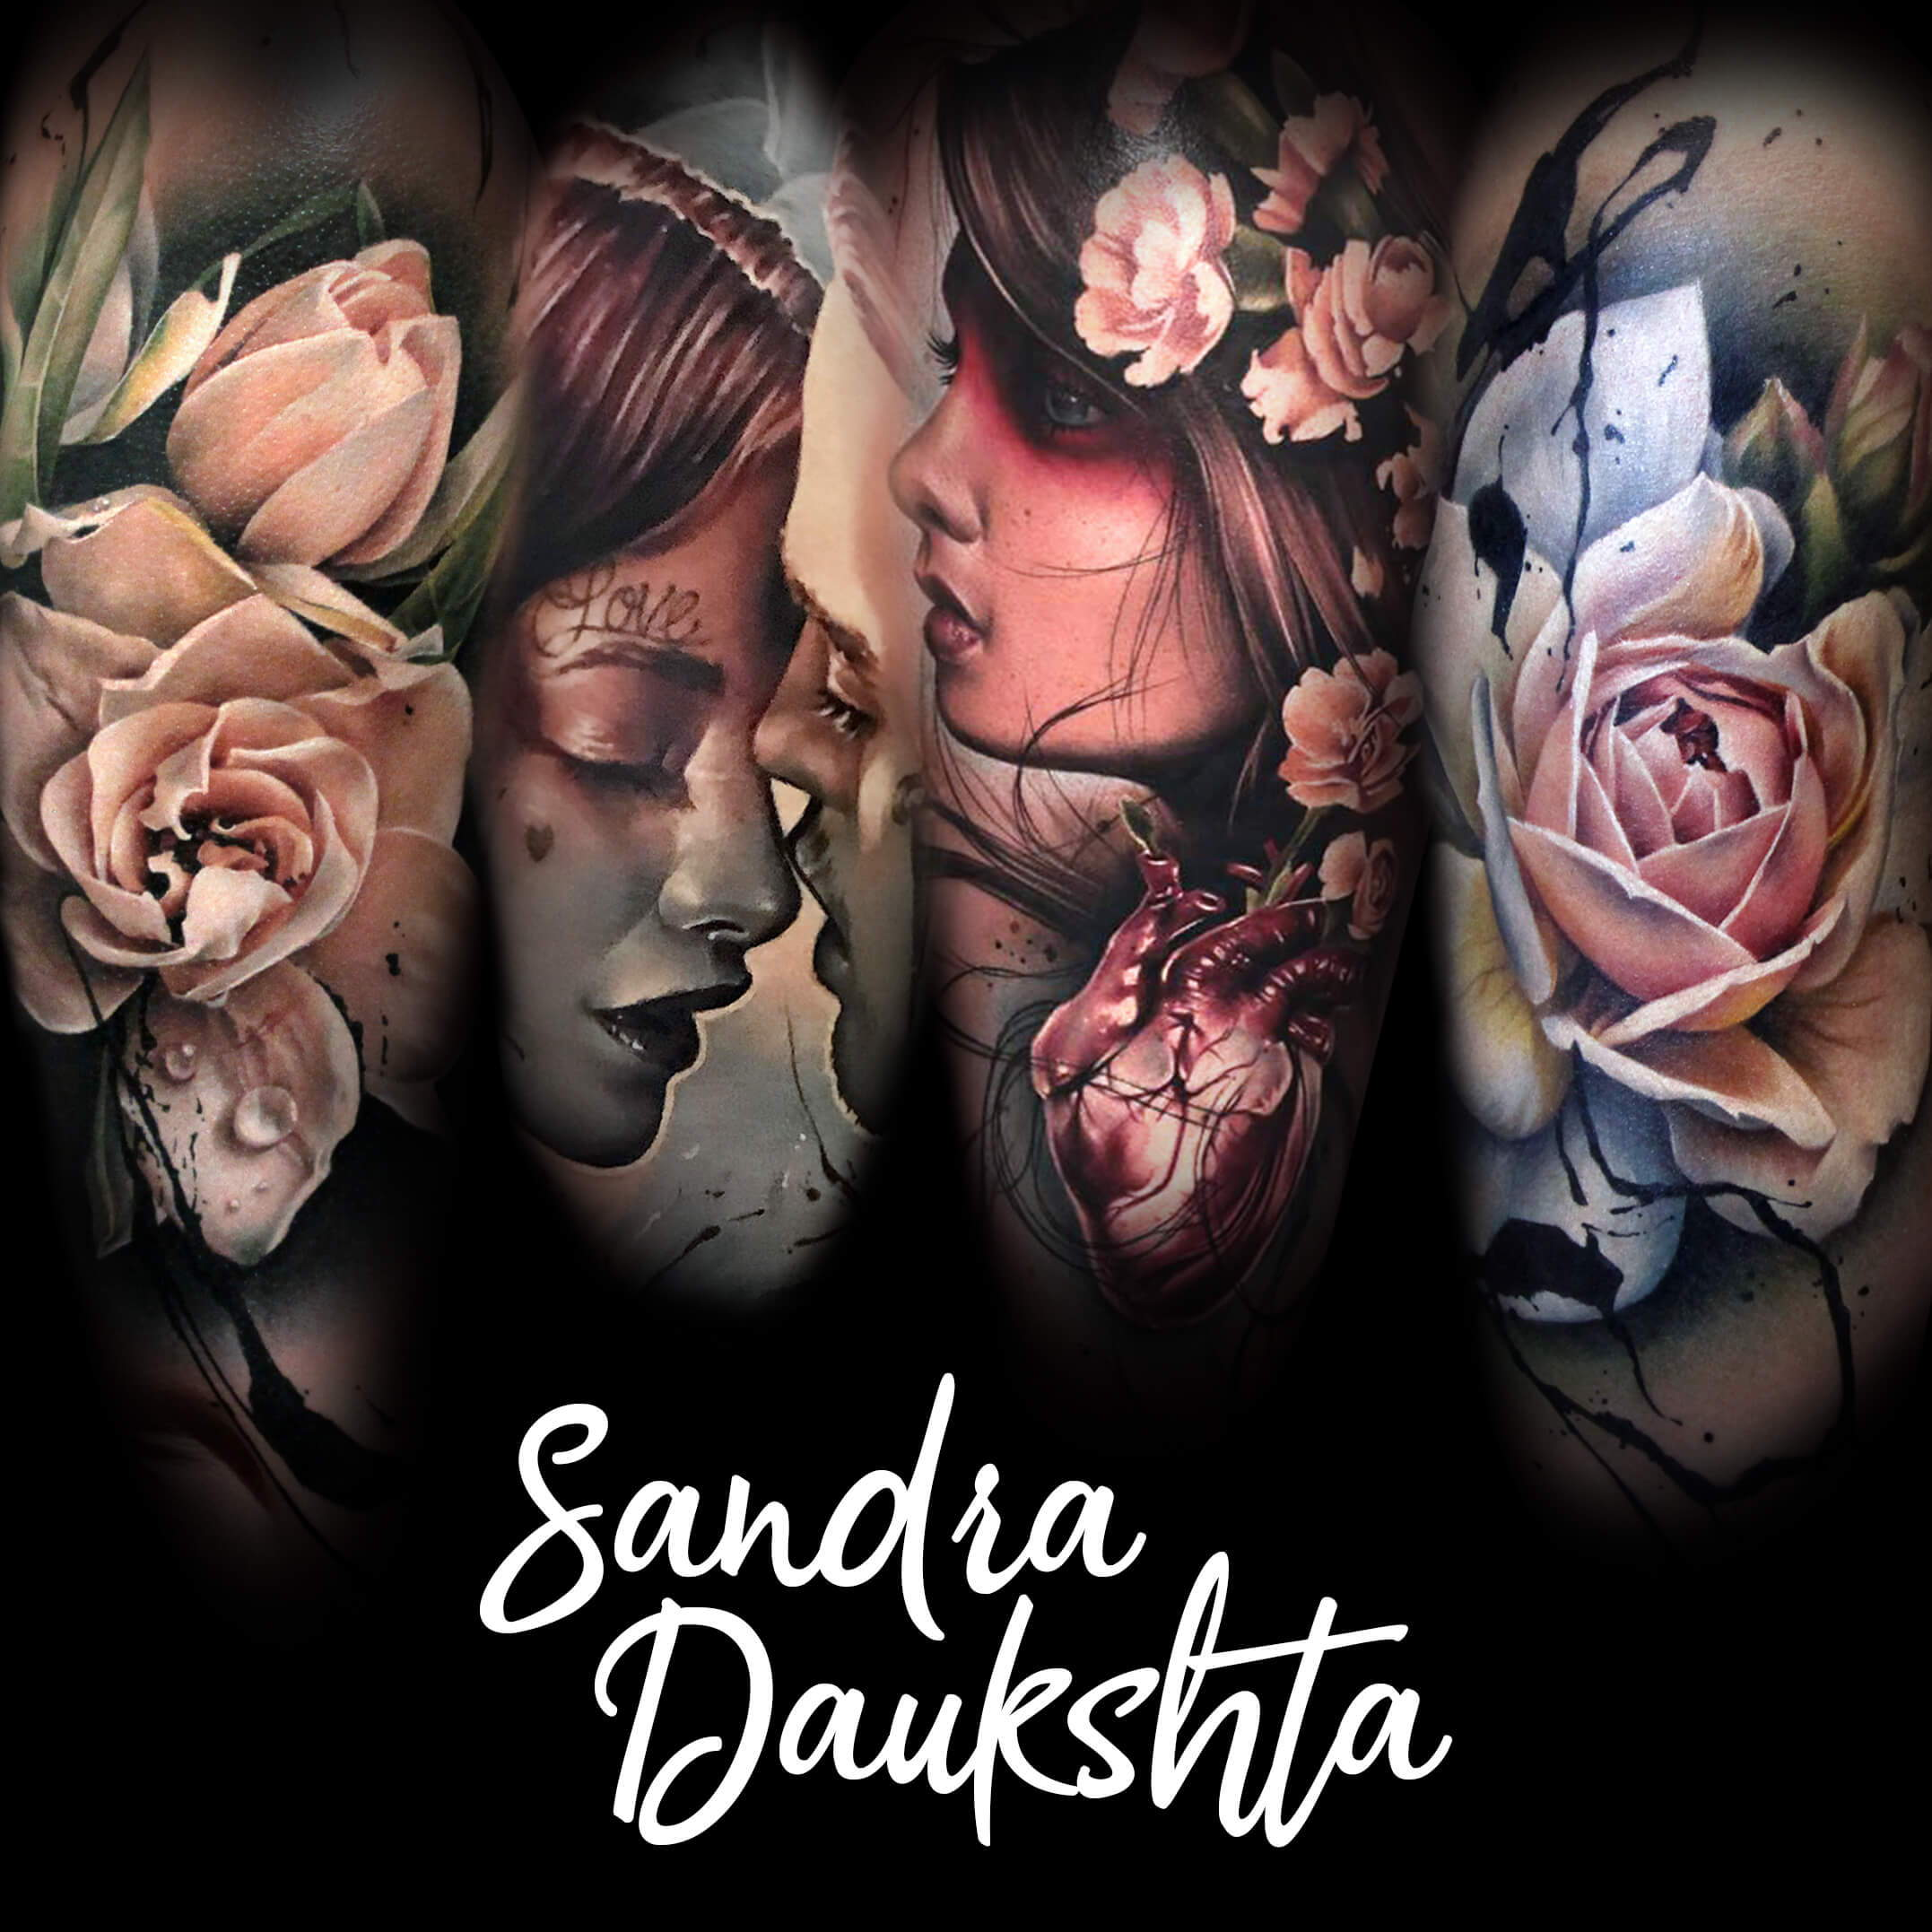 Sandra Daukshta Pro Series Set